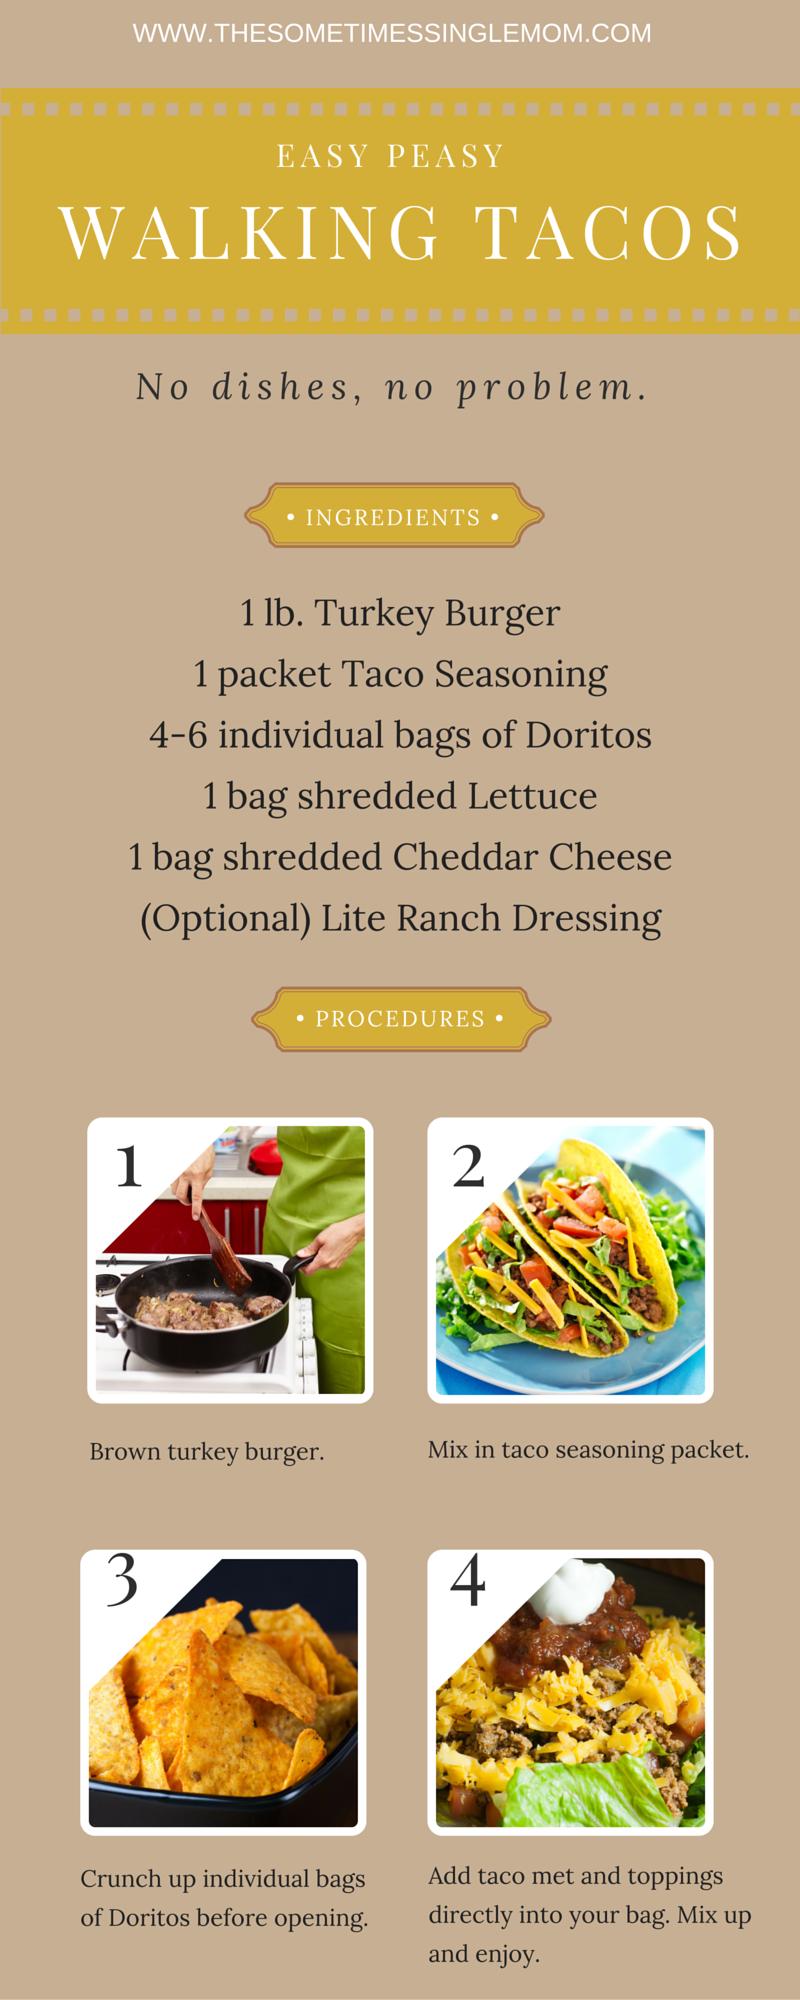 Walking_taco_recipe